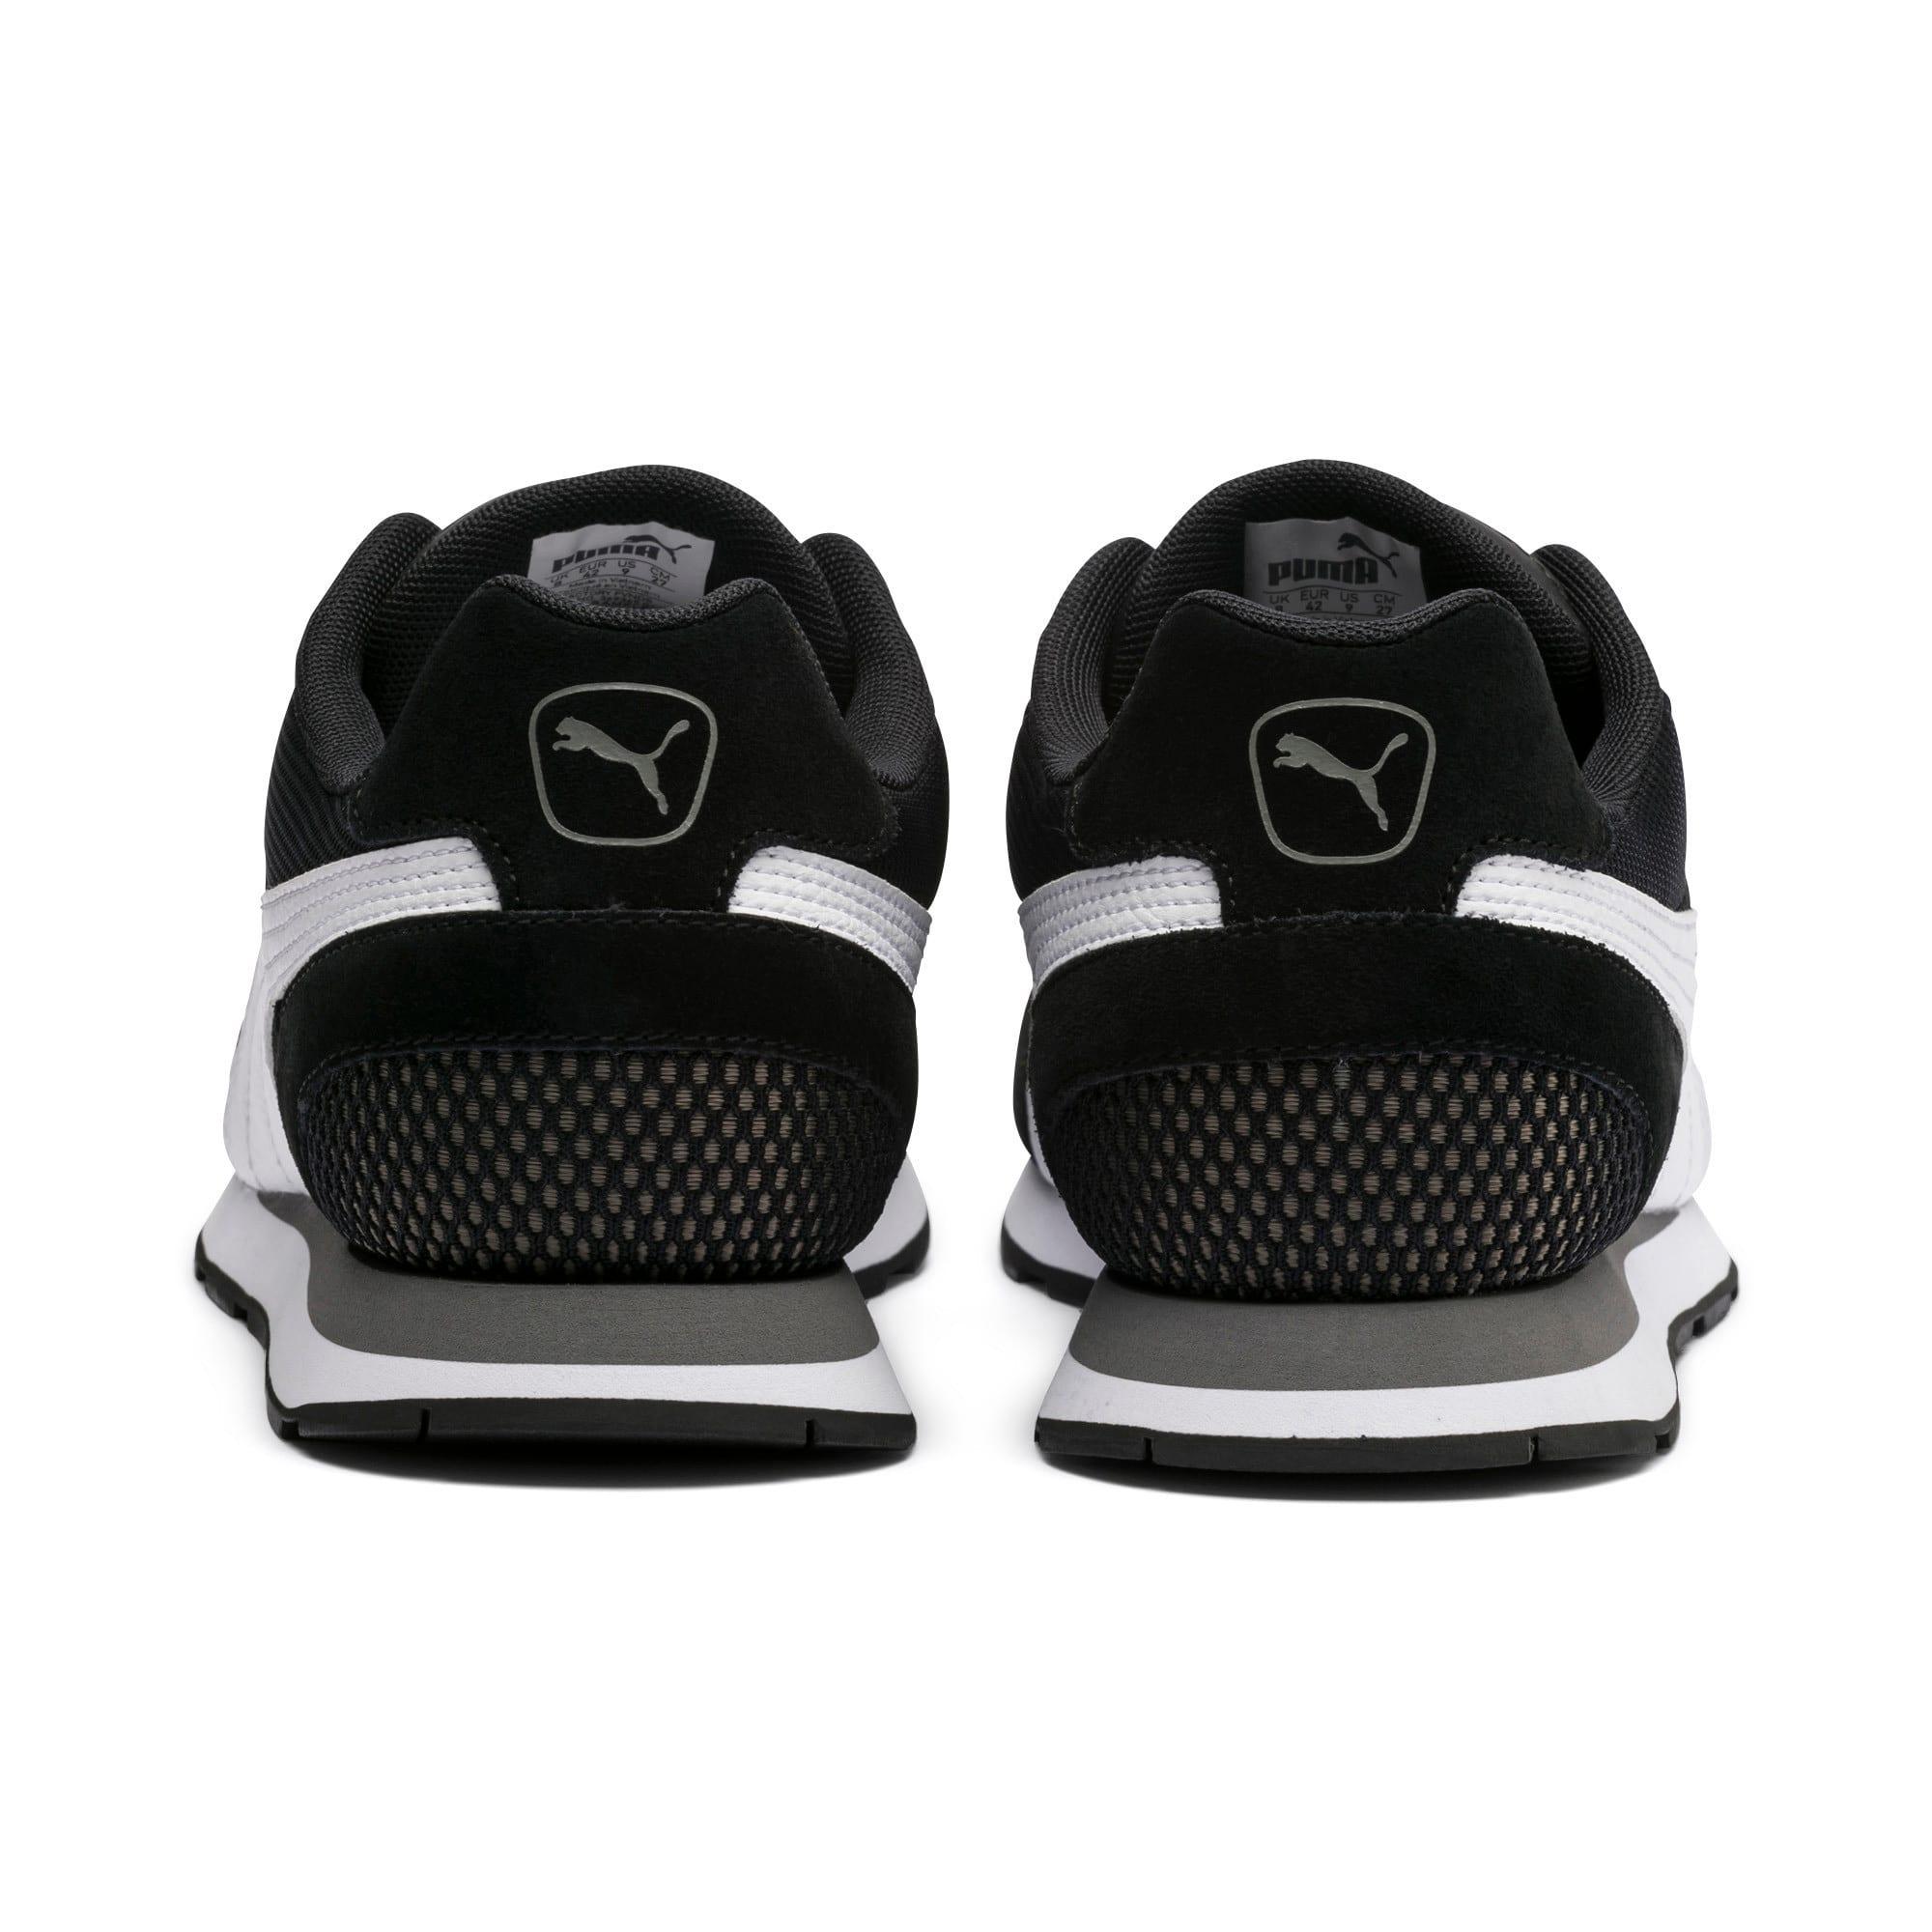 Miniatura 4 de Zapatos deportivos Vista, Black-White-Charcoal Gray, mediano